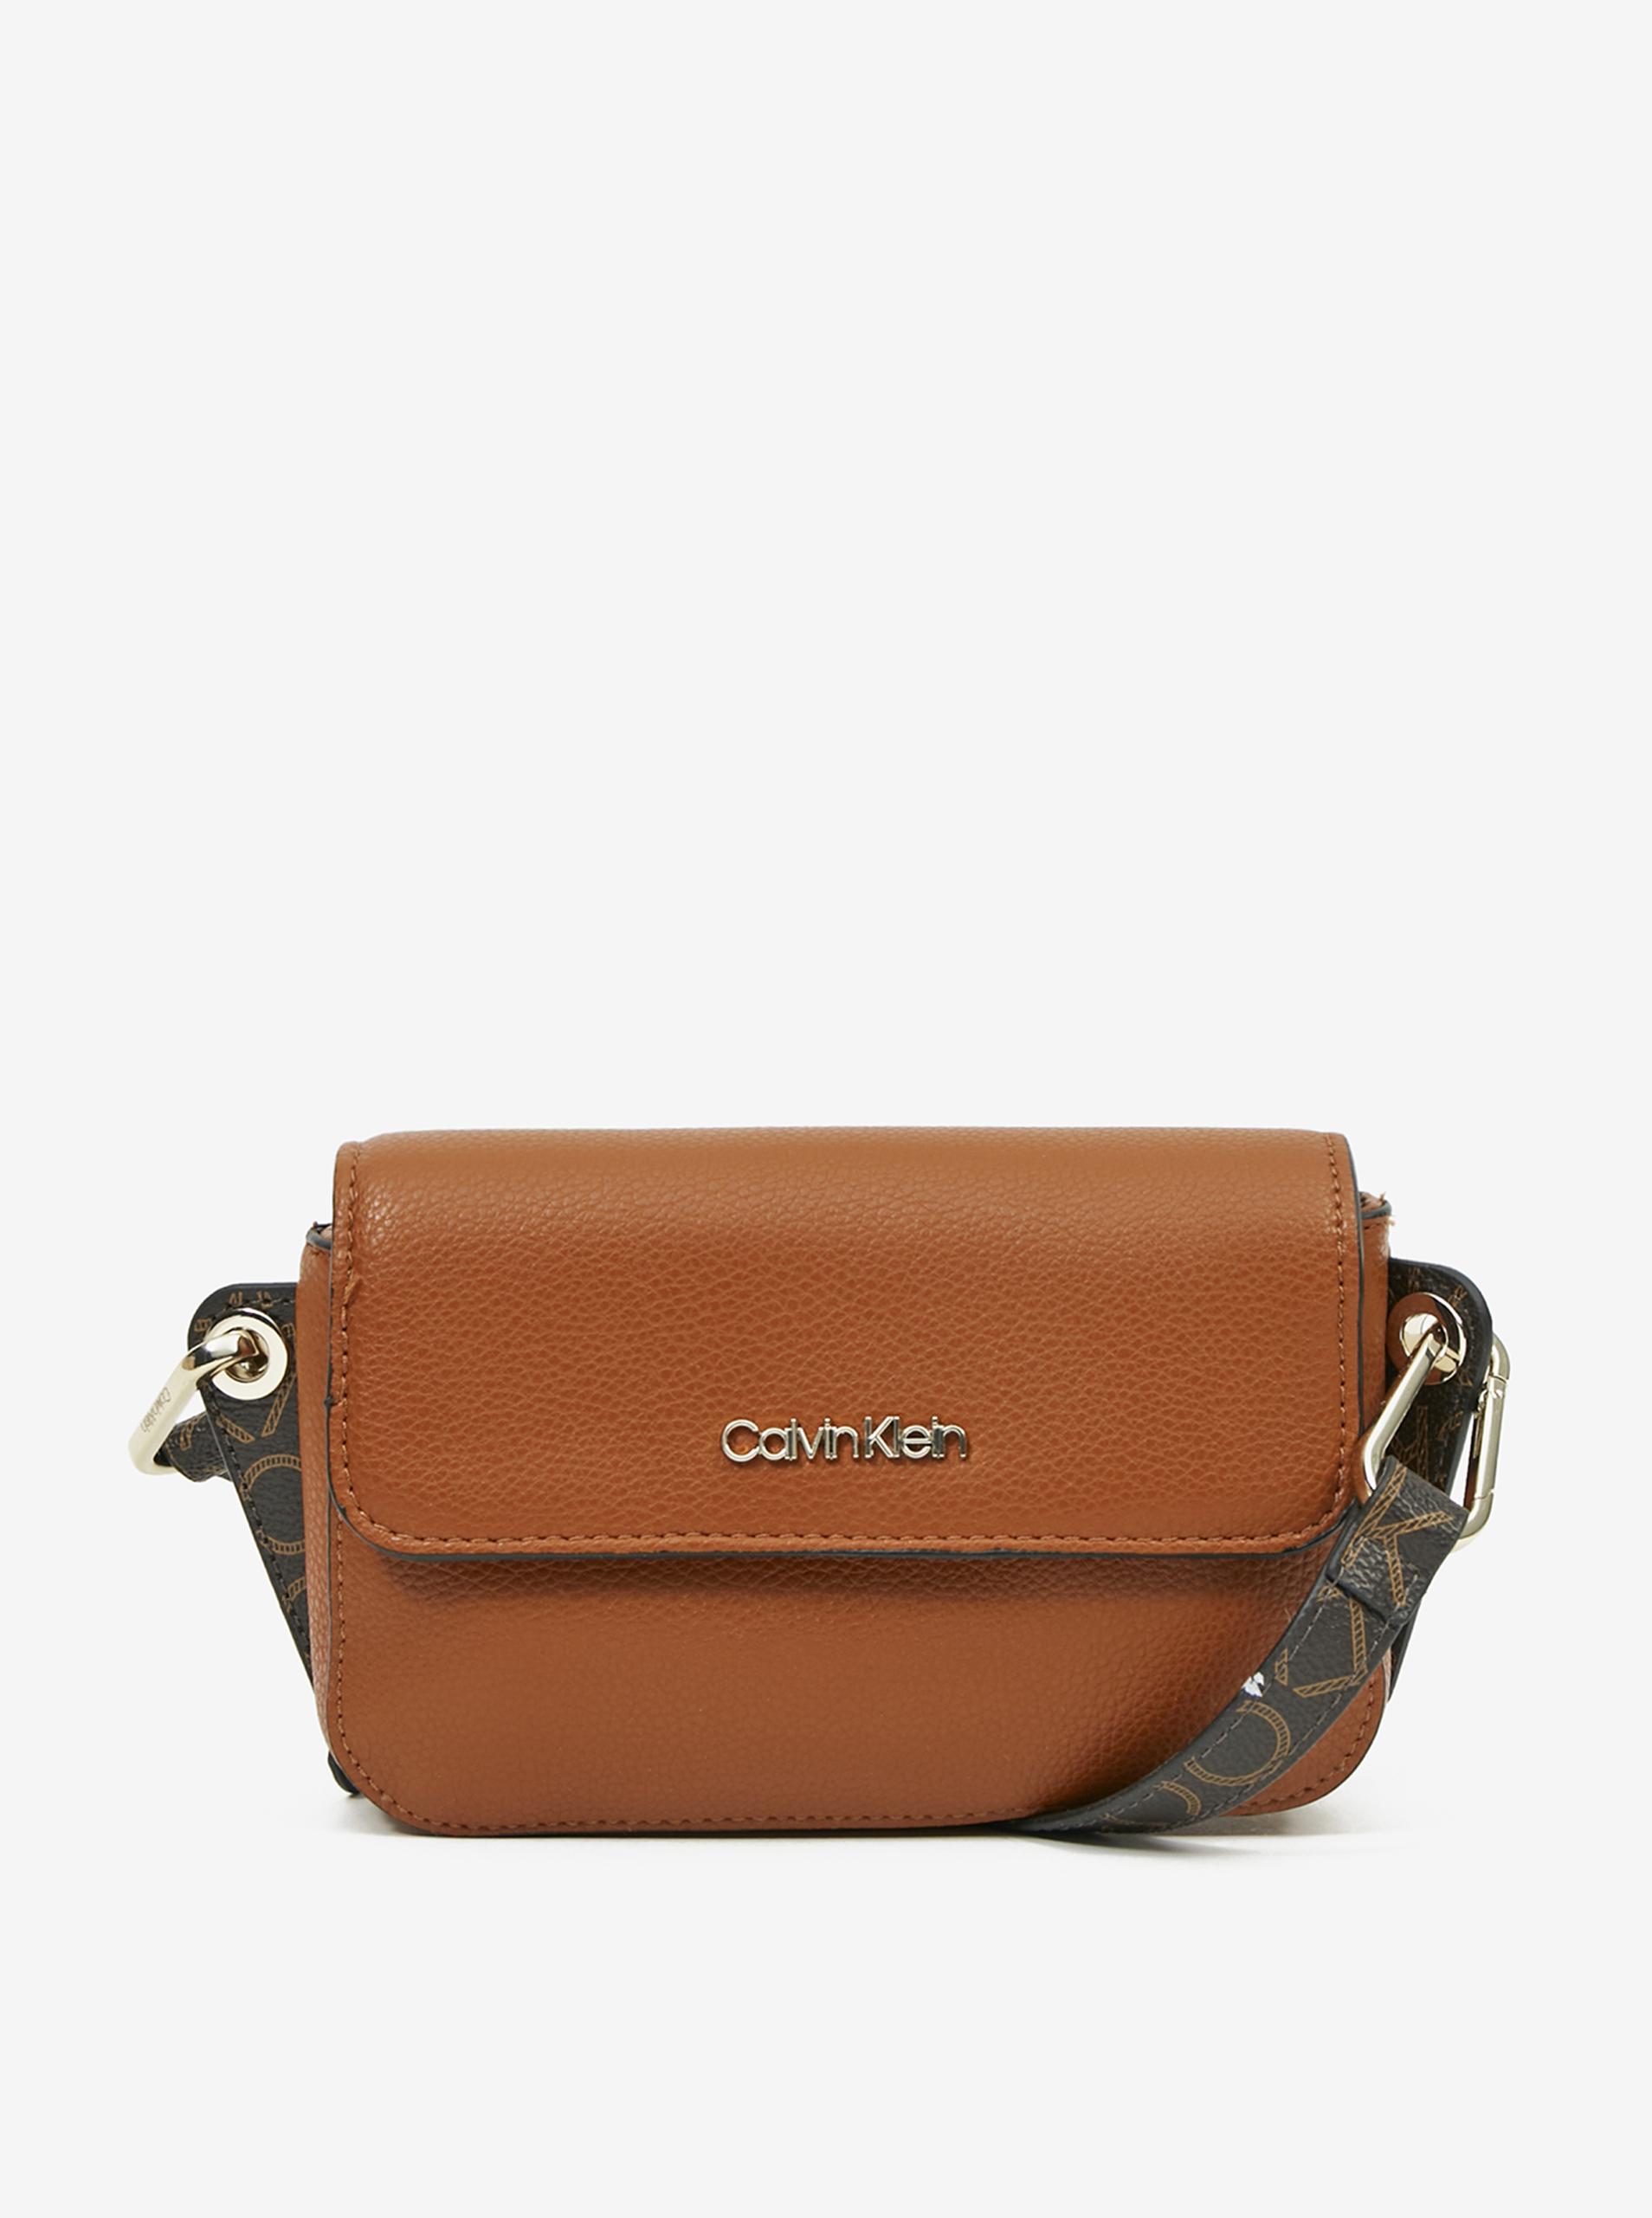 Calvin Klein brązowy crossbody torebka